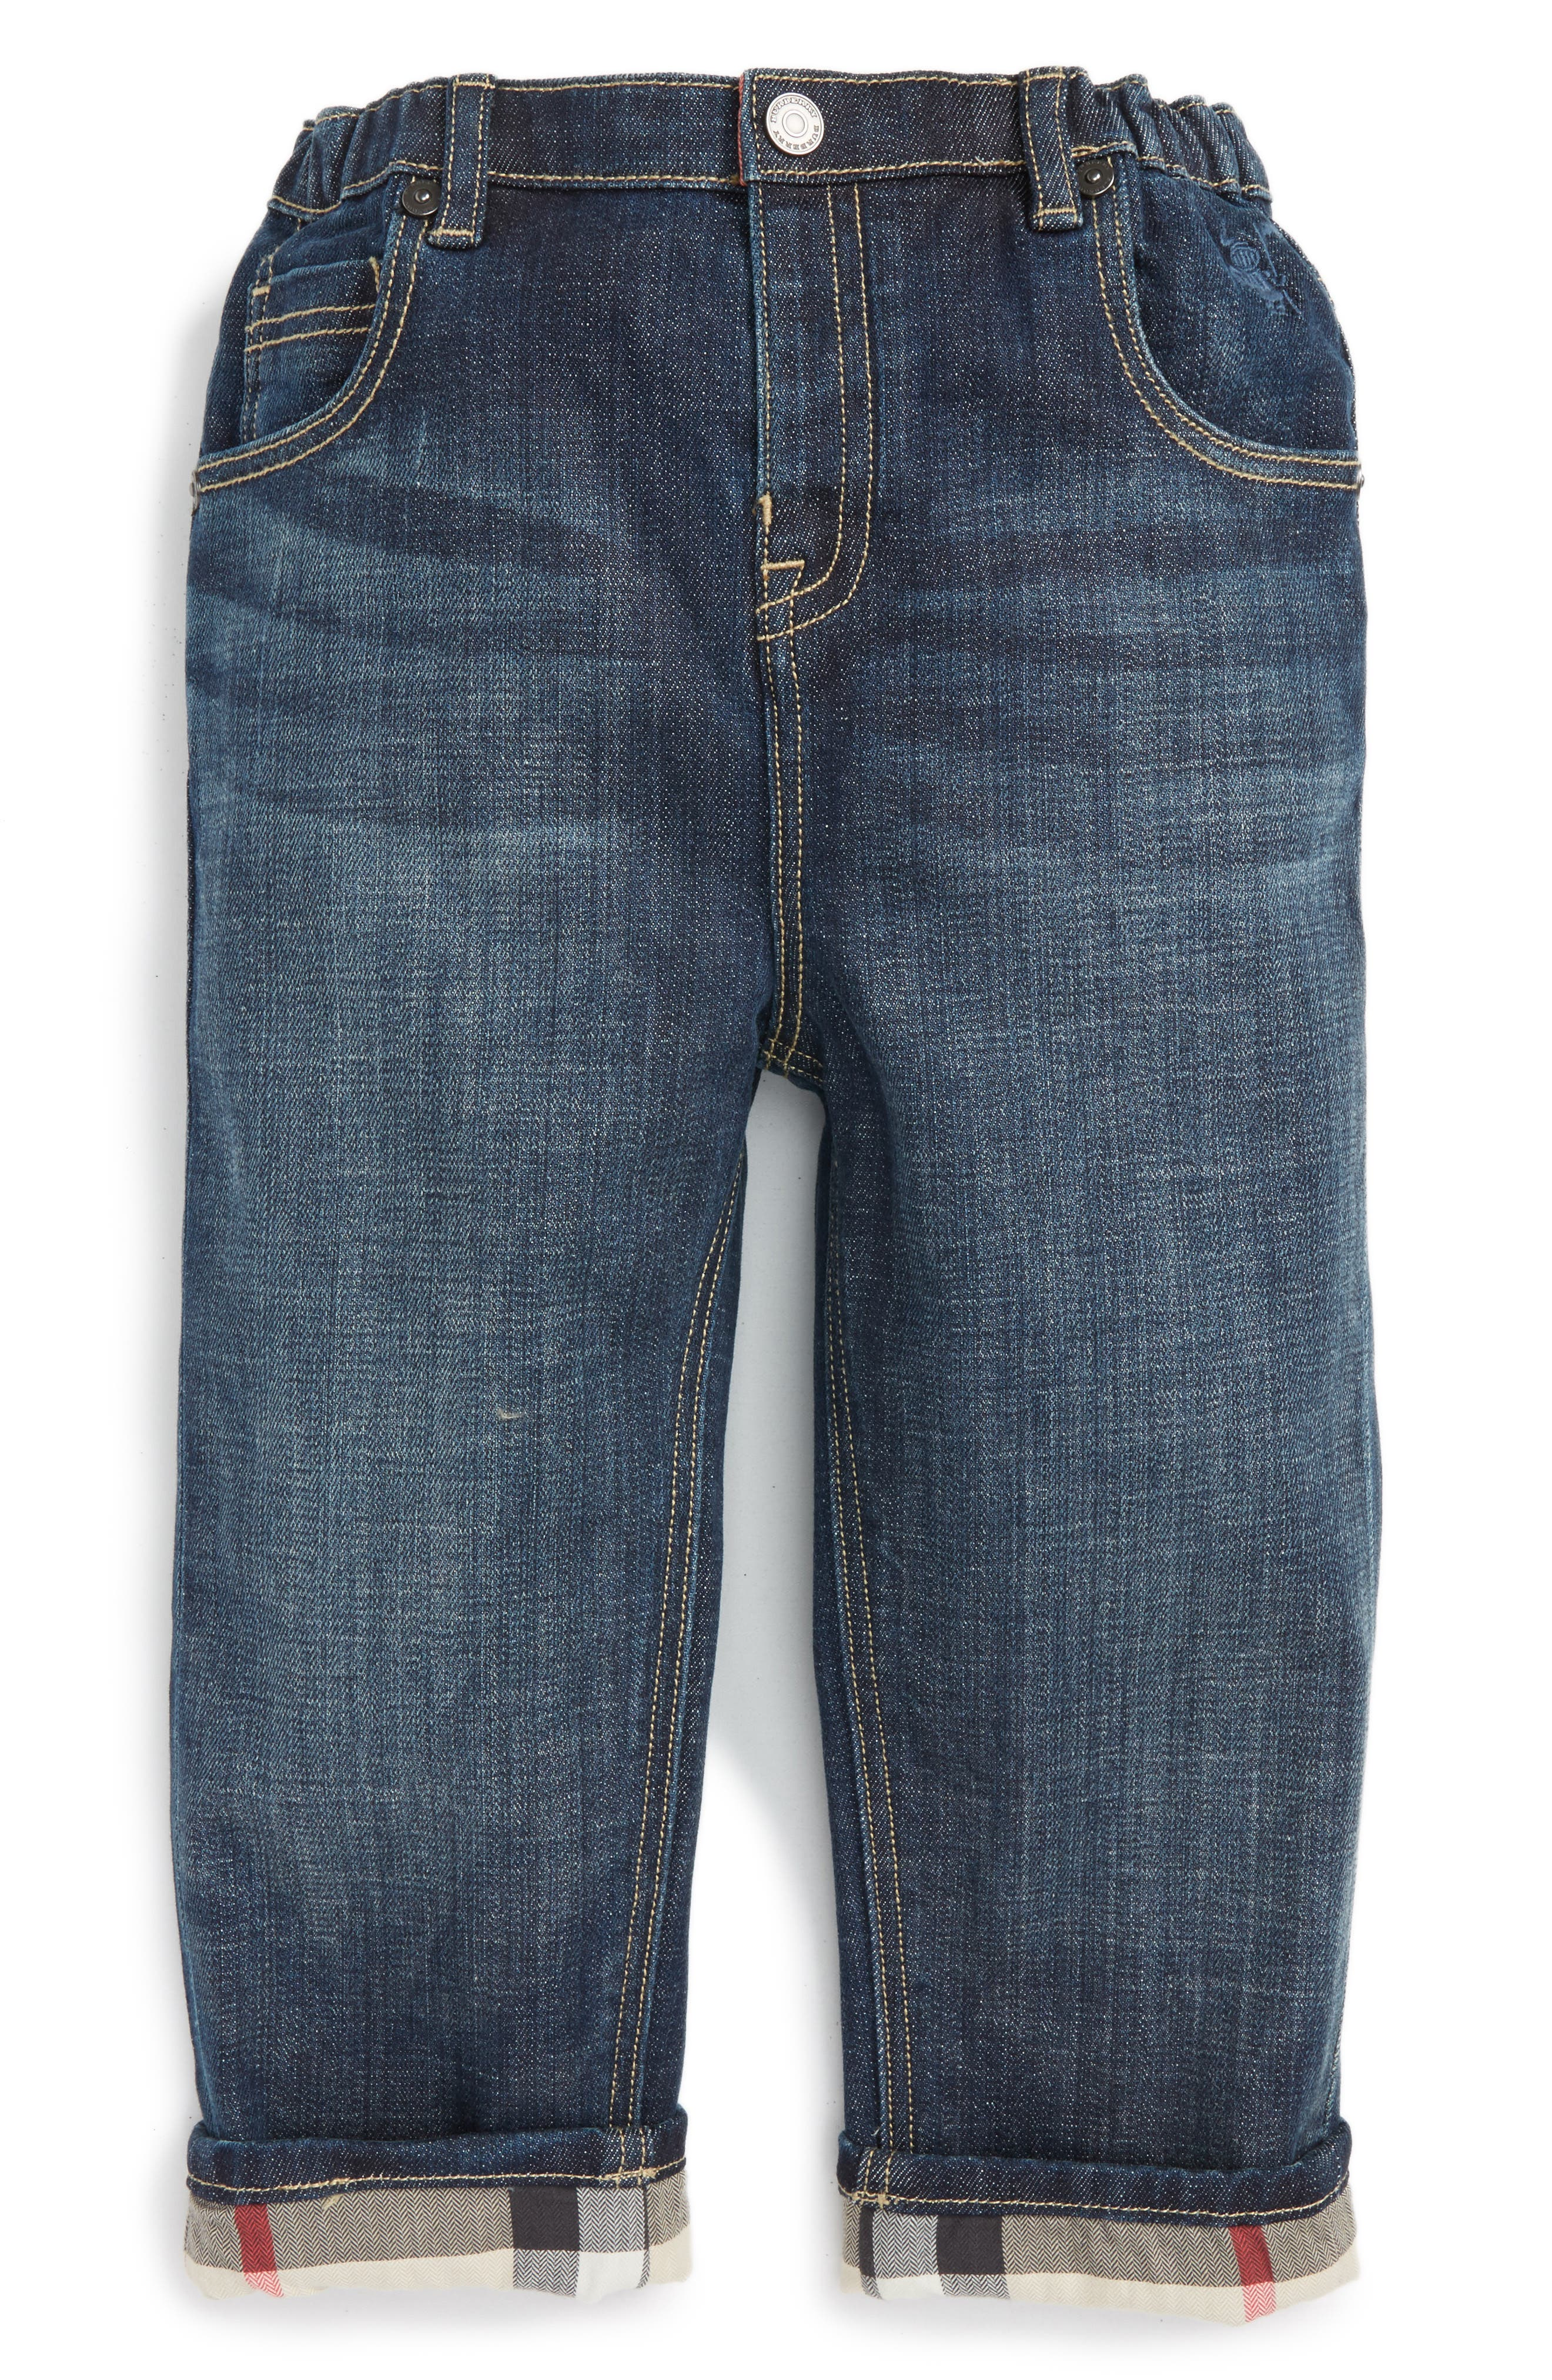 Pierre Check Lined Jeans,                         Main,                         color, Blue